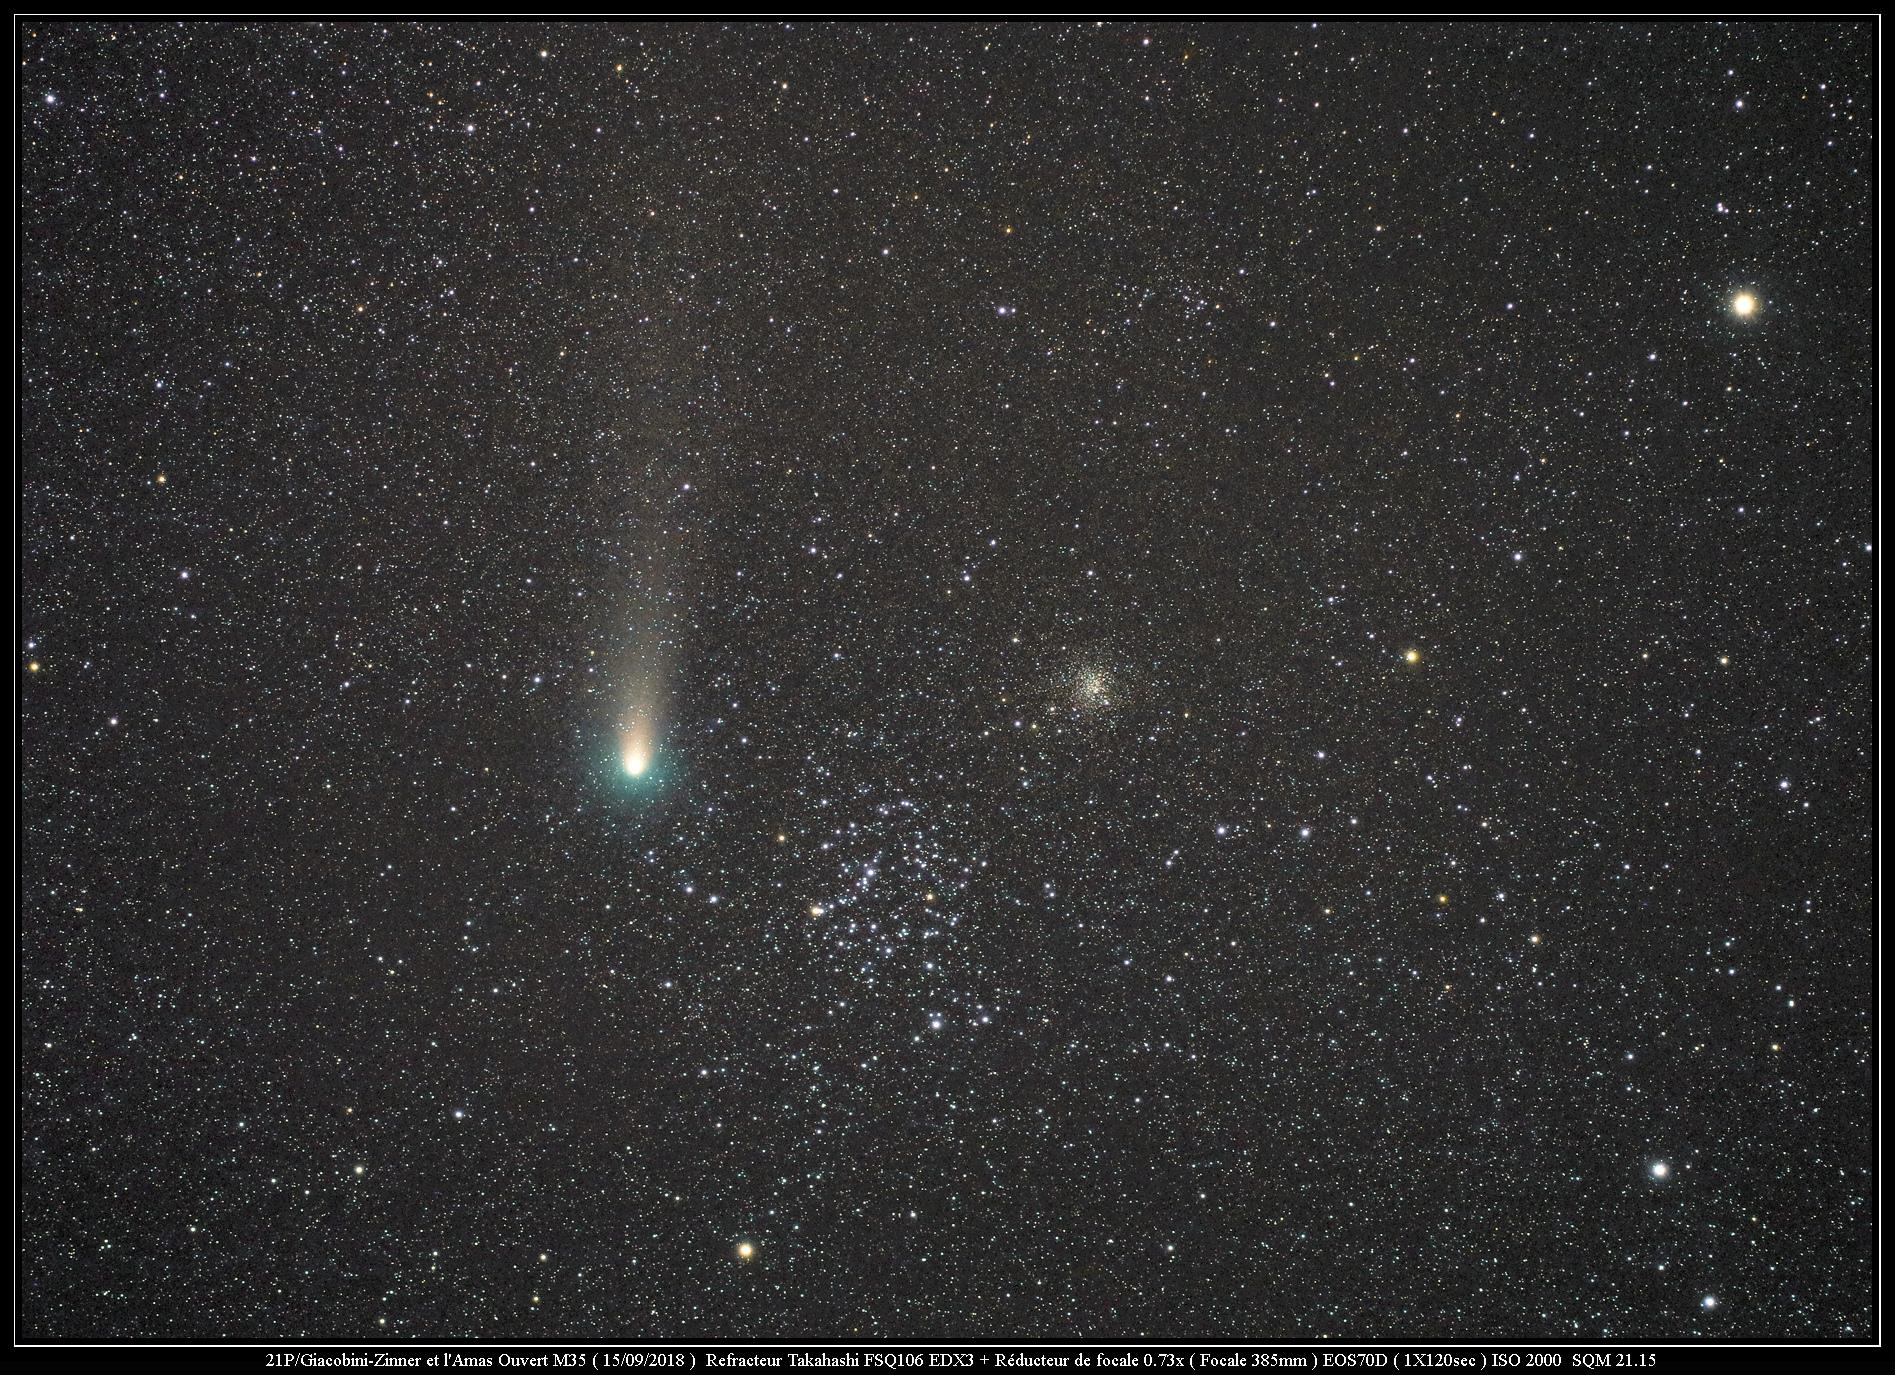 21P/Giacobini-Zinner VS M35